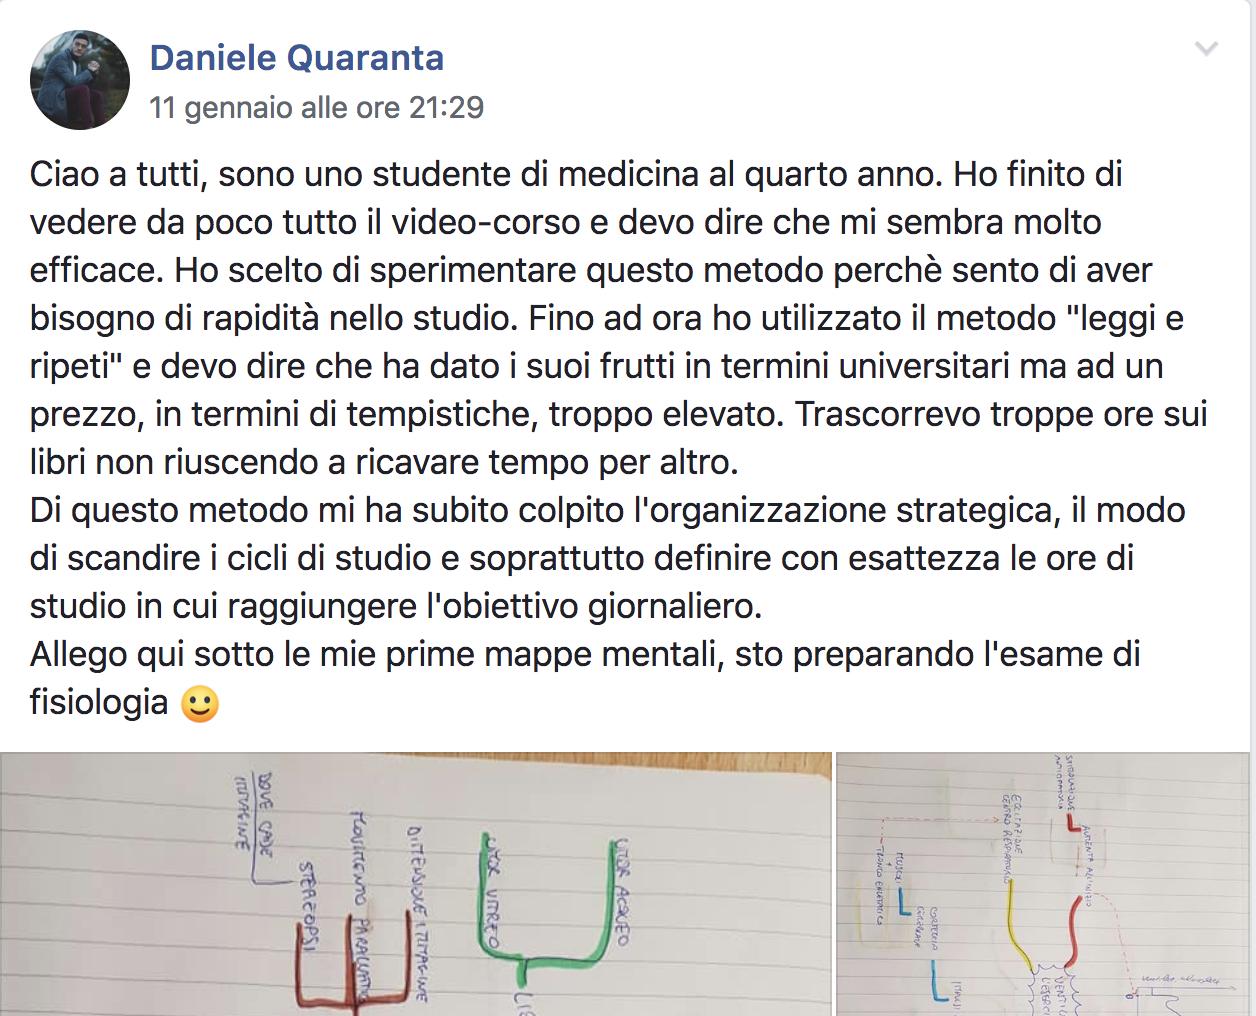 Daniele Quaranta testimonial